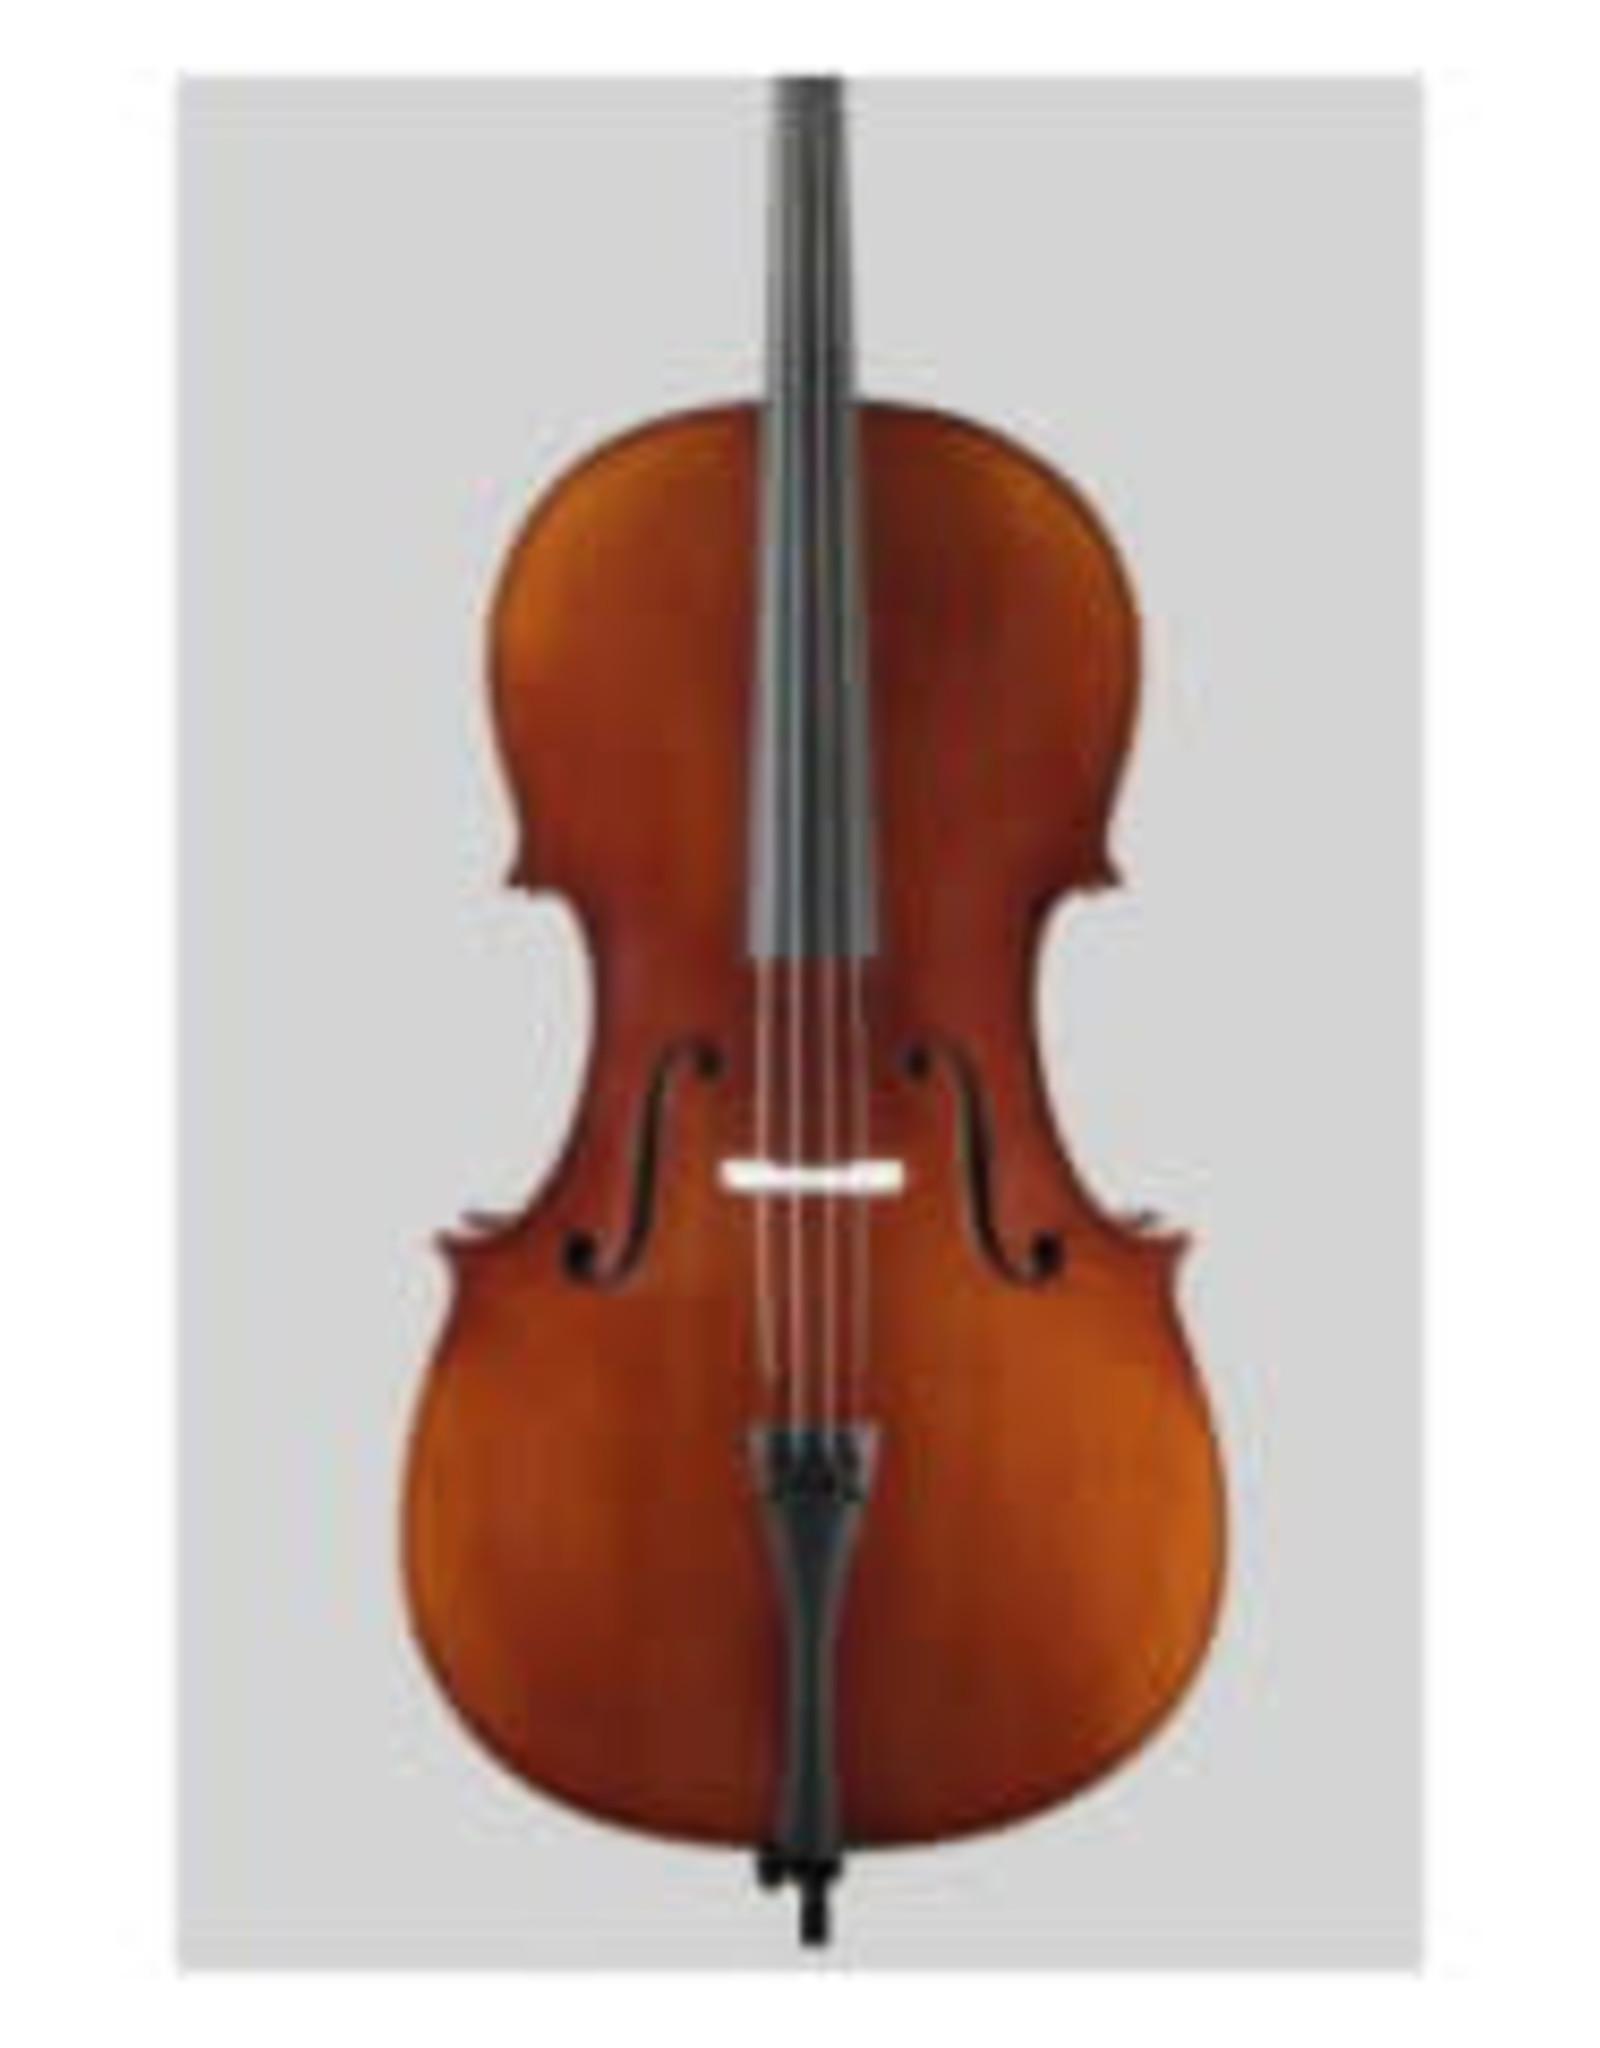 STARTER Sielam Plus Cello 3/4  antique- ebben toets en acc - Opgezet in eigen atelier